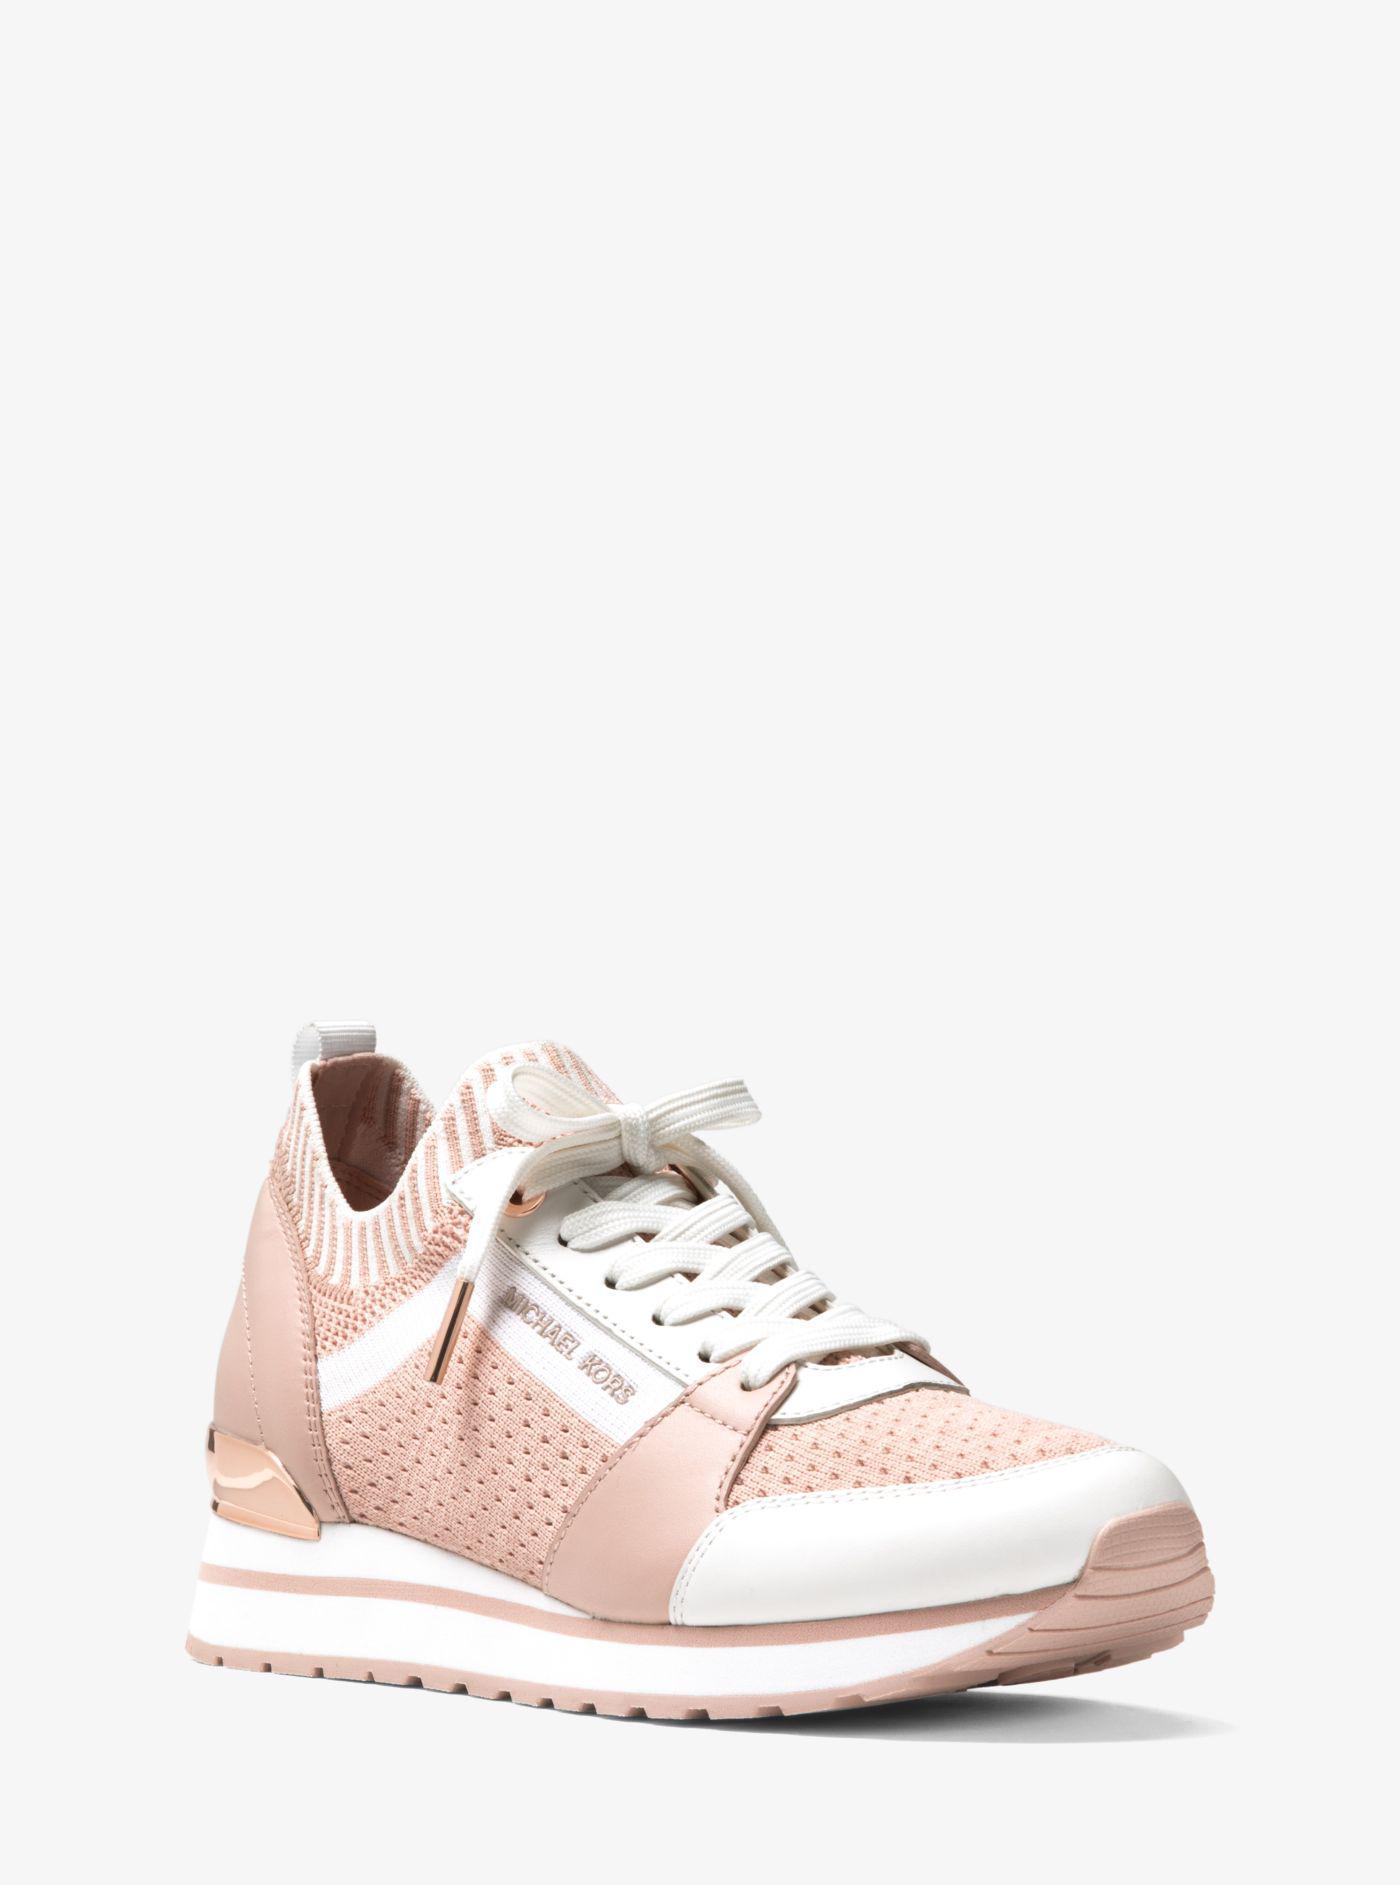 Michael Kors Leather Billie Knit